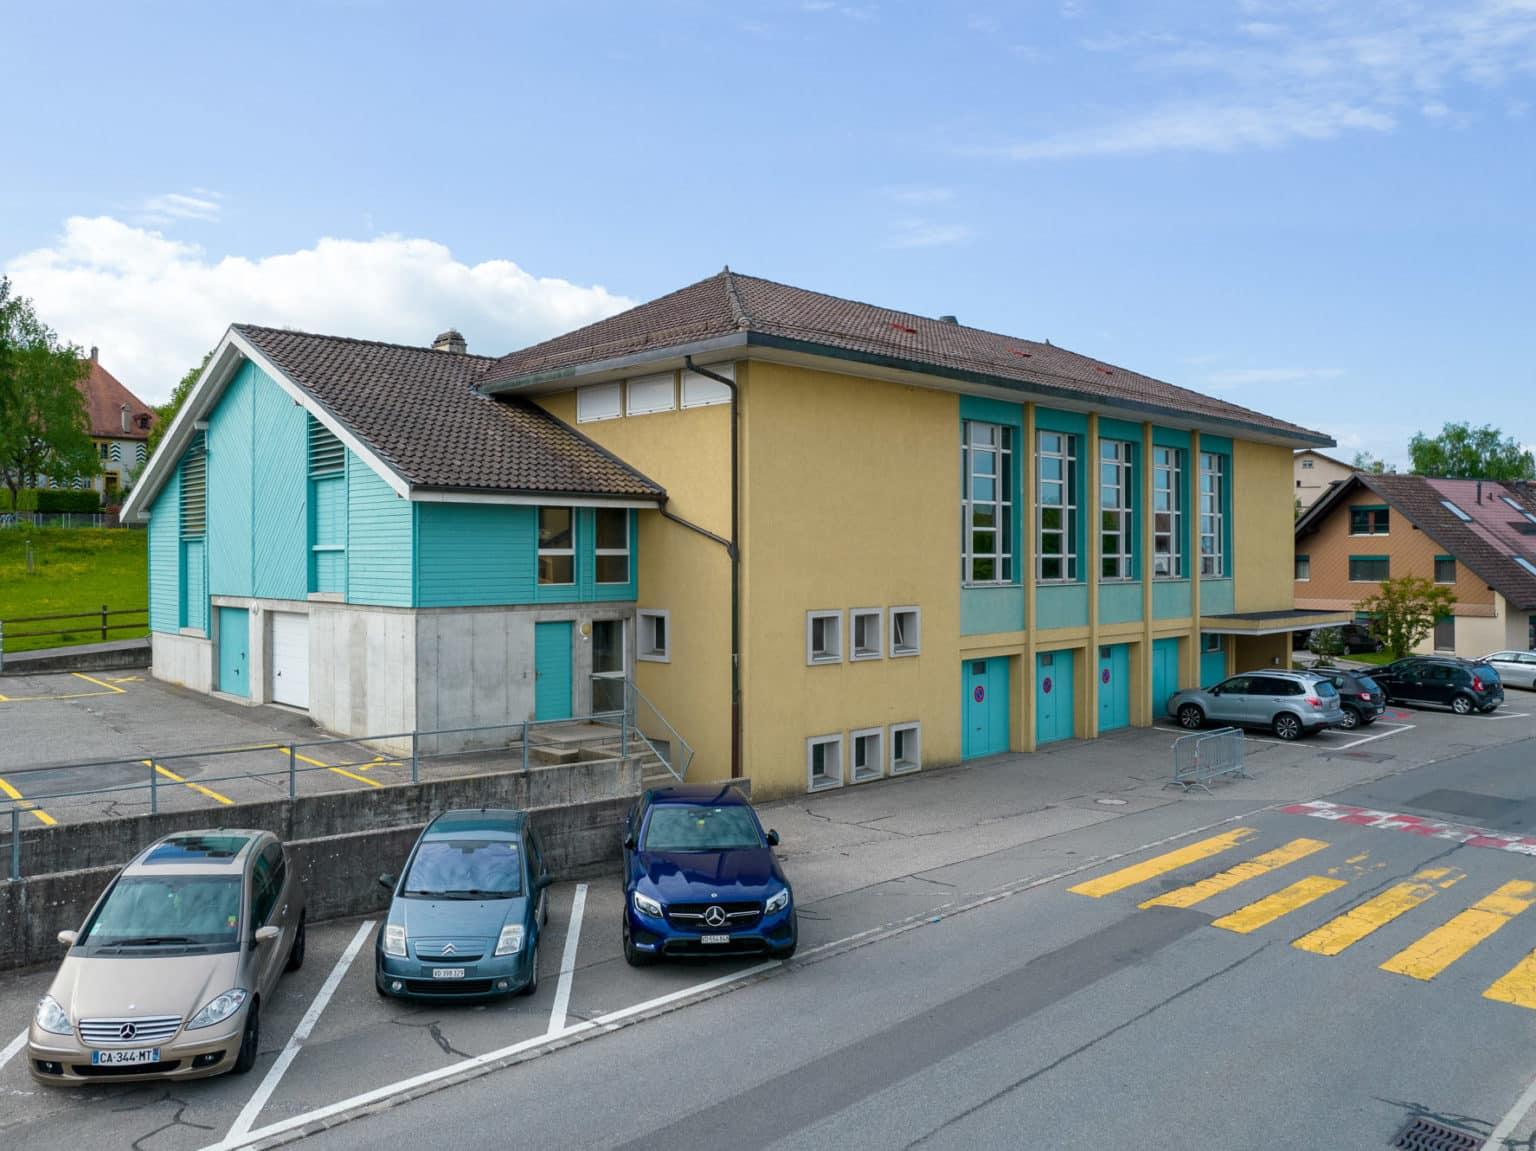 Refuges-salles-Montanaire©V-Dubach-0016